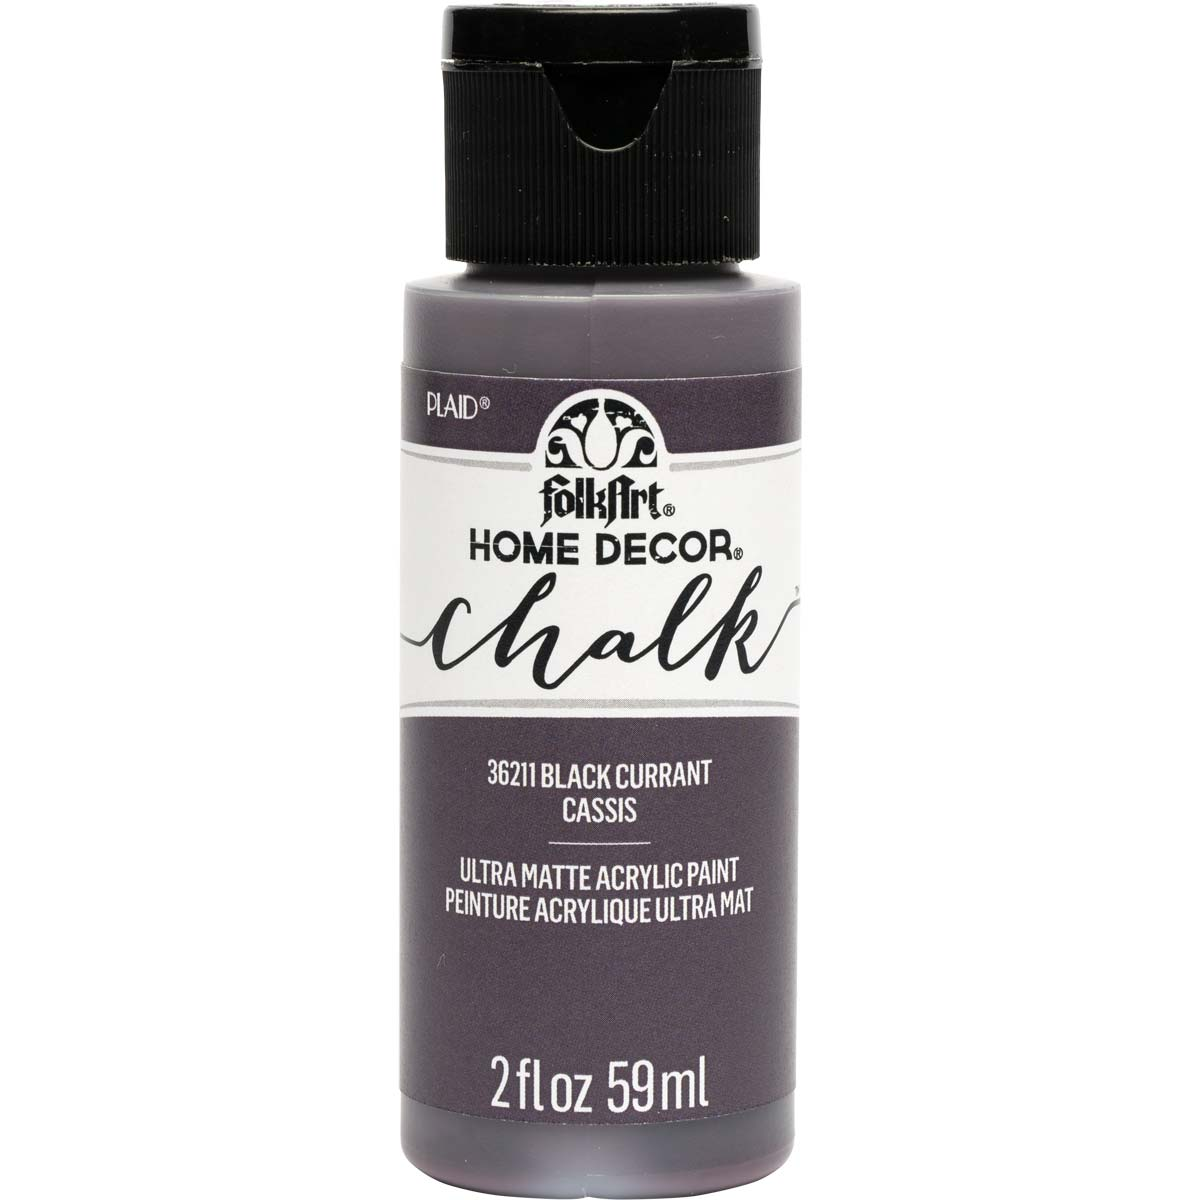 FolkArt Home Decor Chalk - Black Currant, 2 oz. - 36211